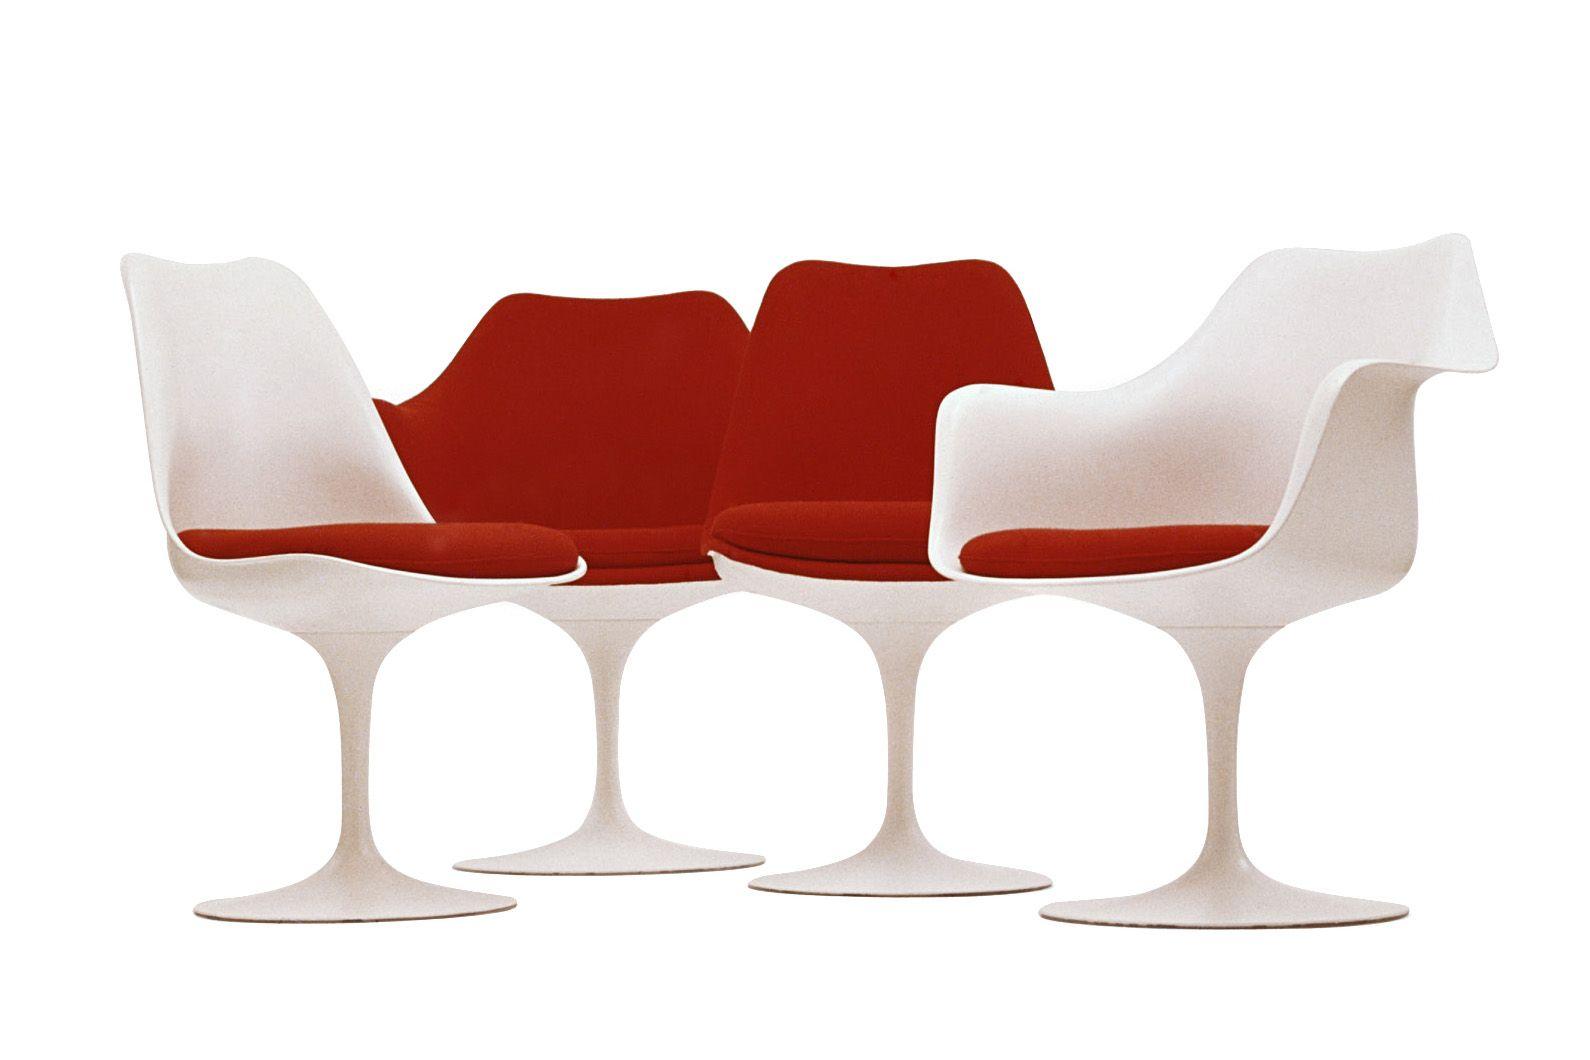 furniture + object/ tulip chairs/ eero saarinen/ 1955